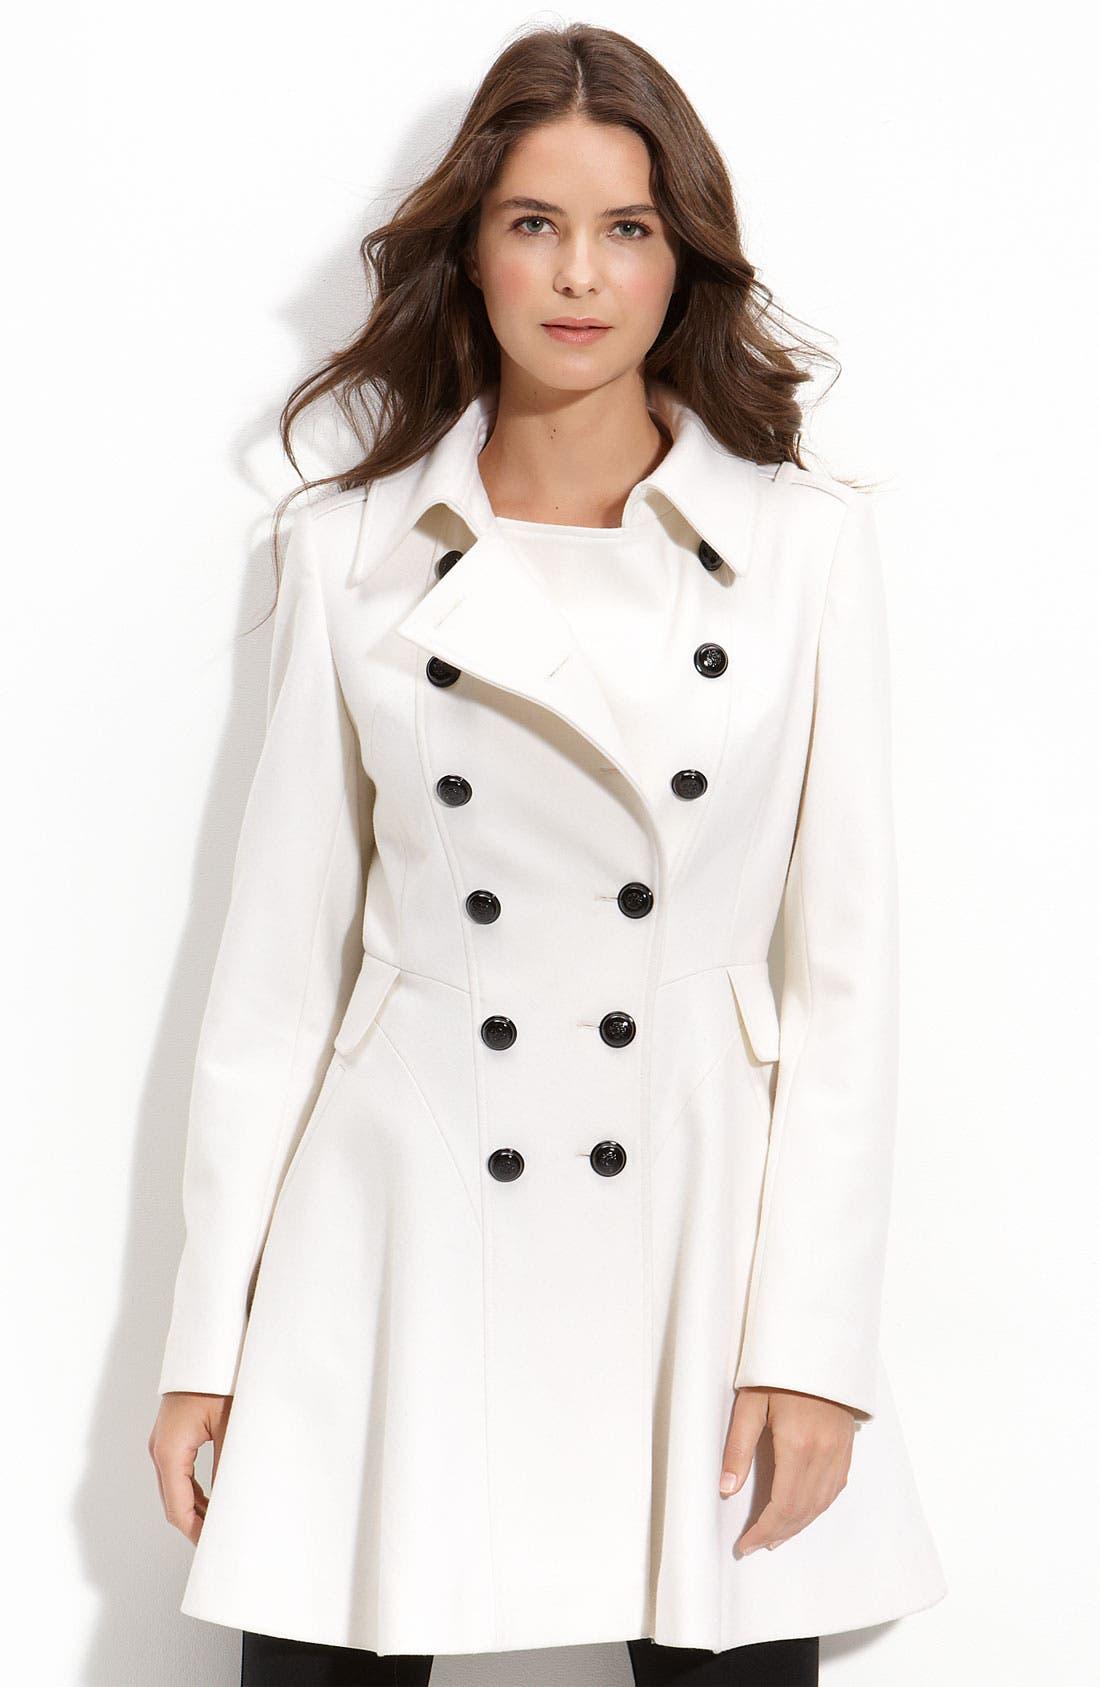 Alternate Image 1 Selected - Via Spiga 'Novara' Double Breasted Coat